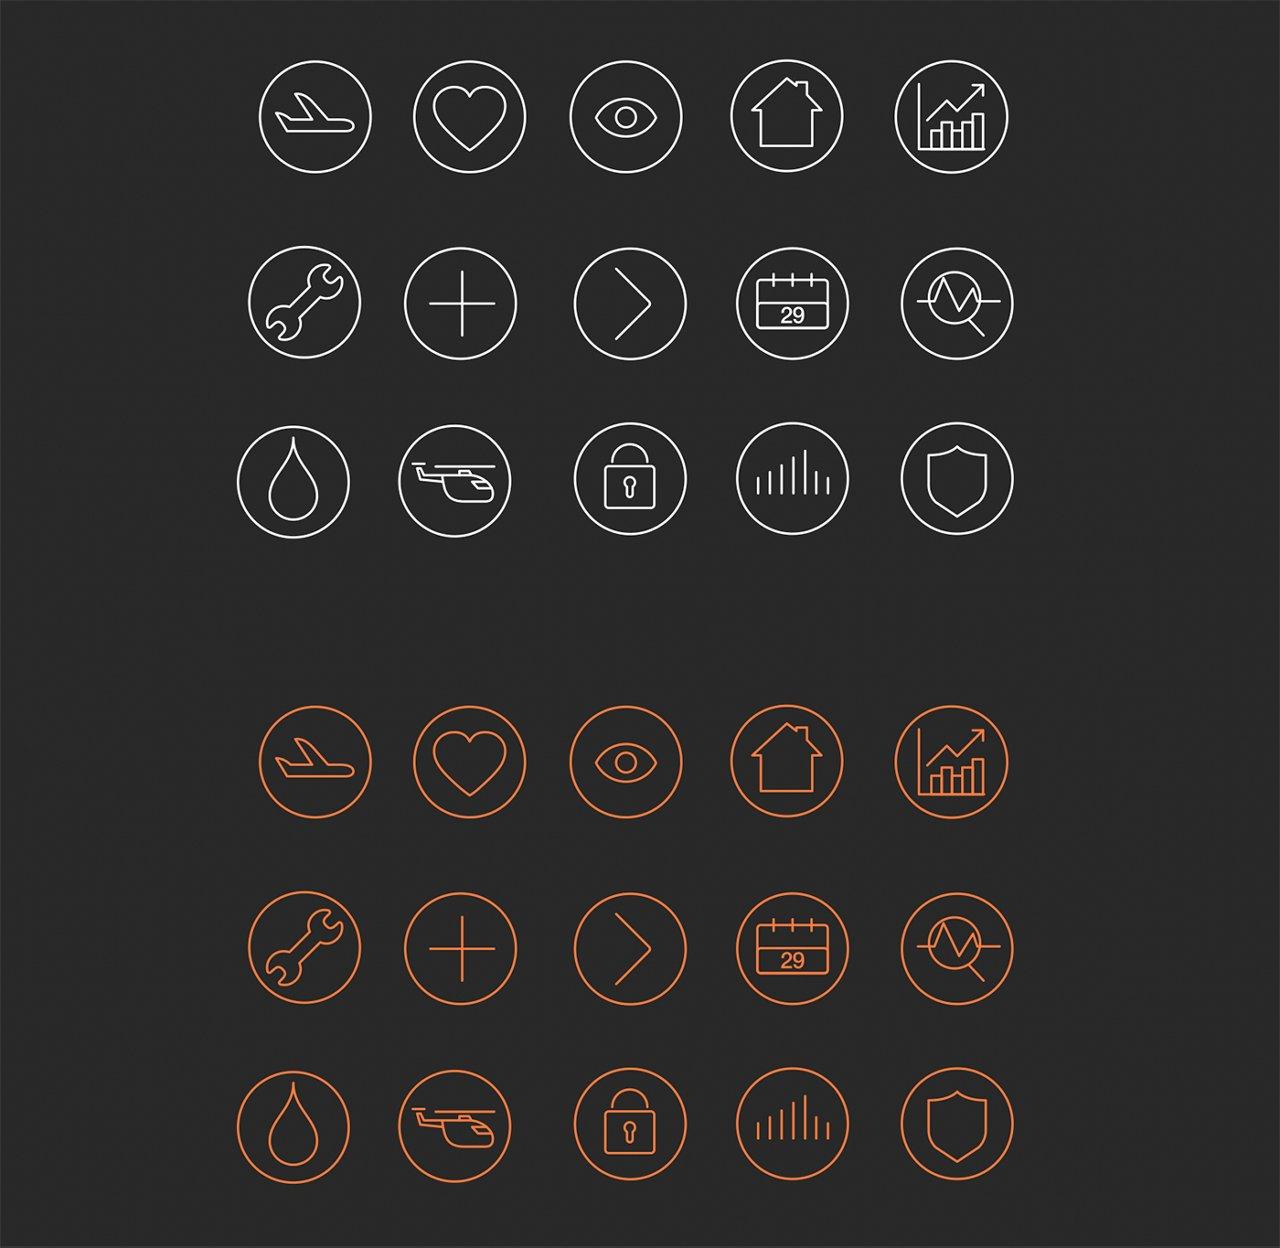 Smartforce Graphicelements Pictograms